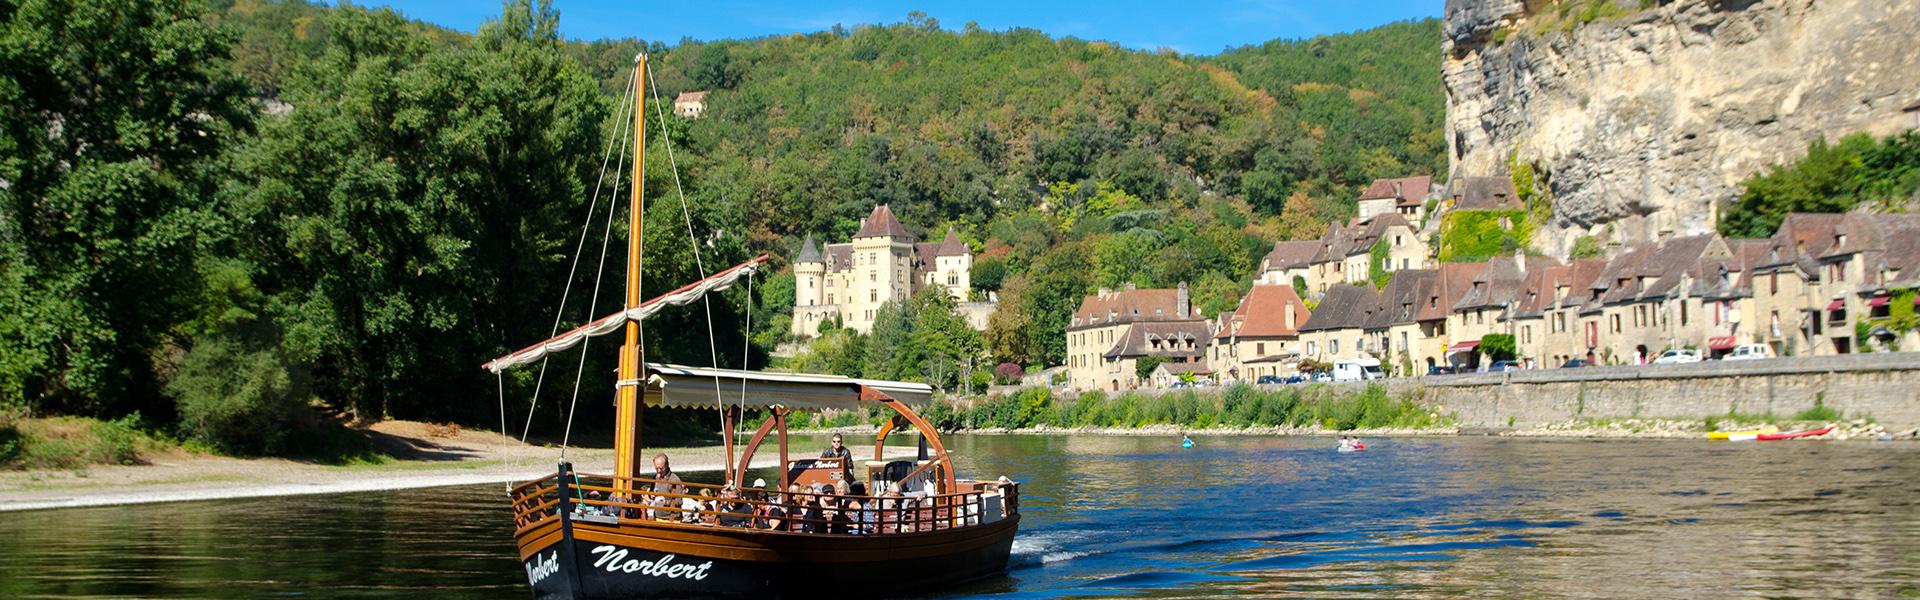 Balade en gabare sur la Dordogne